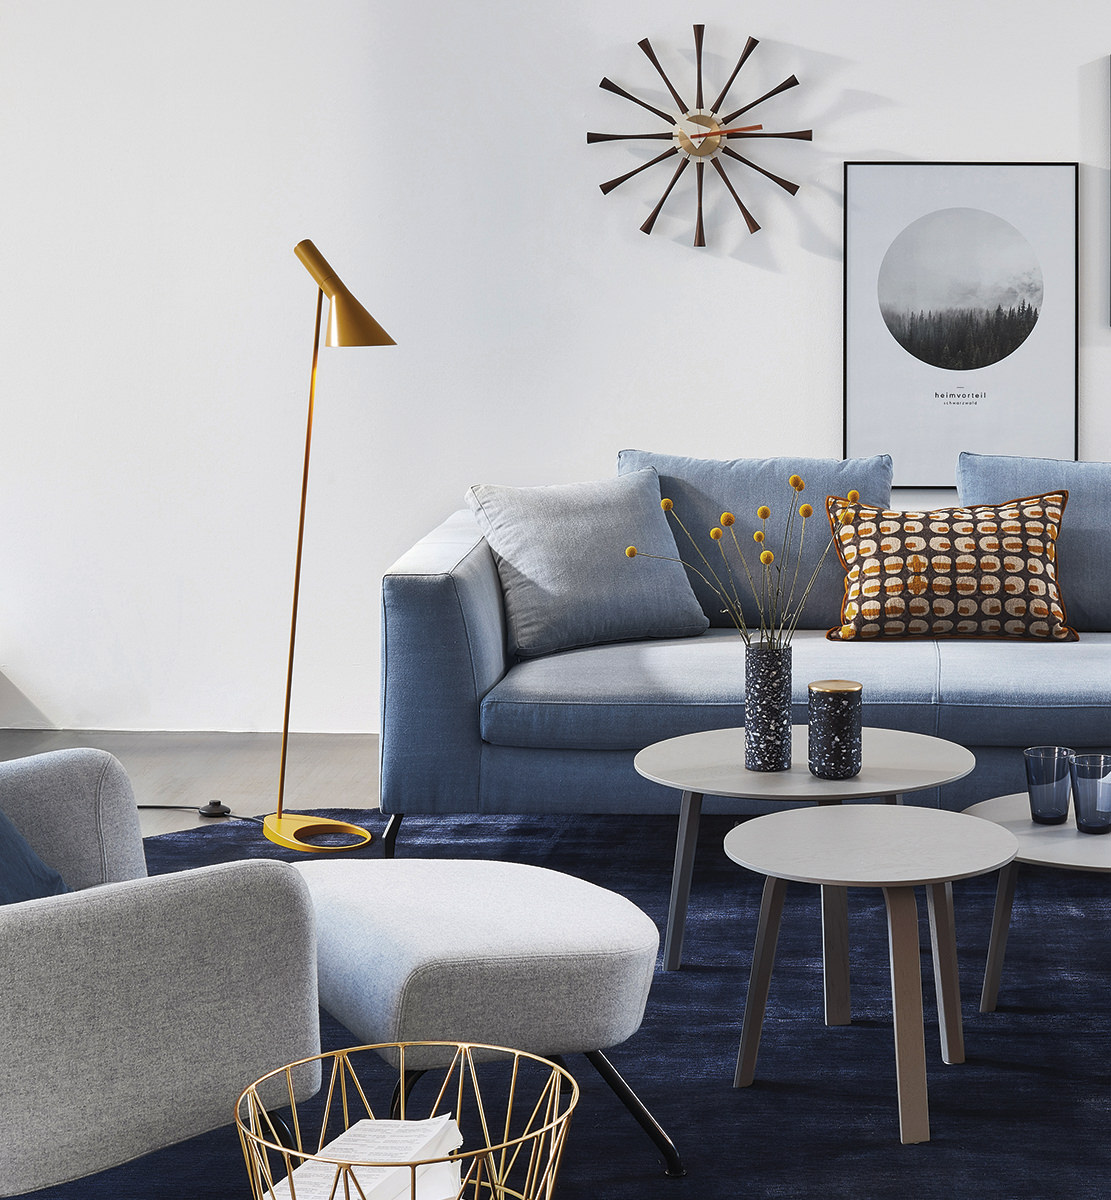 leuchte aj design arne jacobsen von louis poulsen. Black Bedroom Furniture Sets. Home Design Ideas